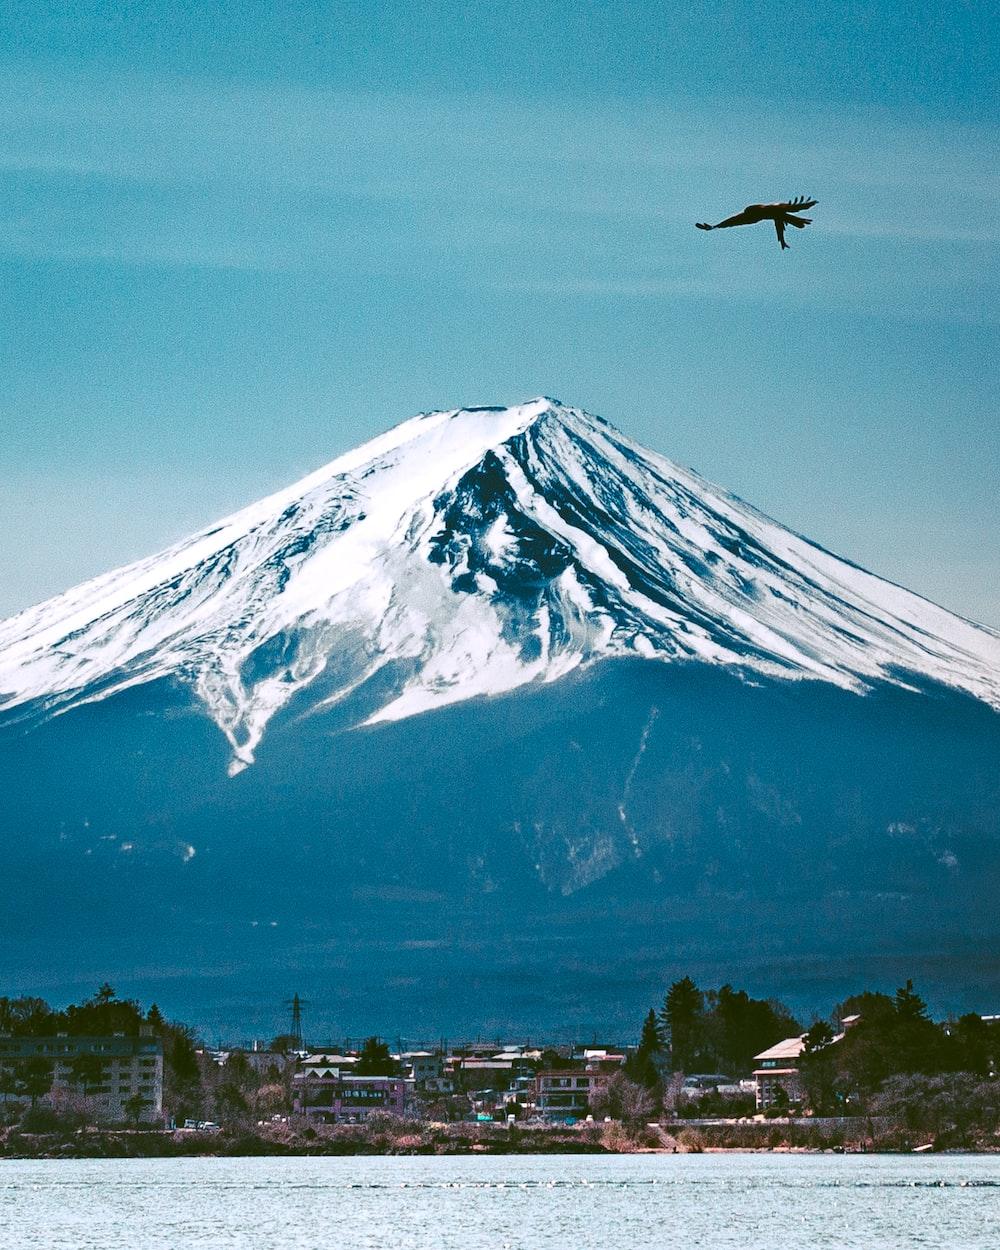 bird flying near snow mountain